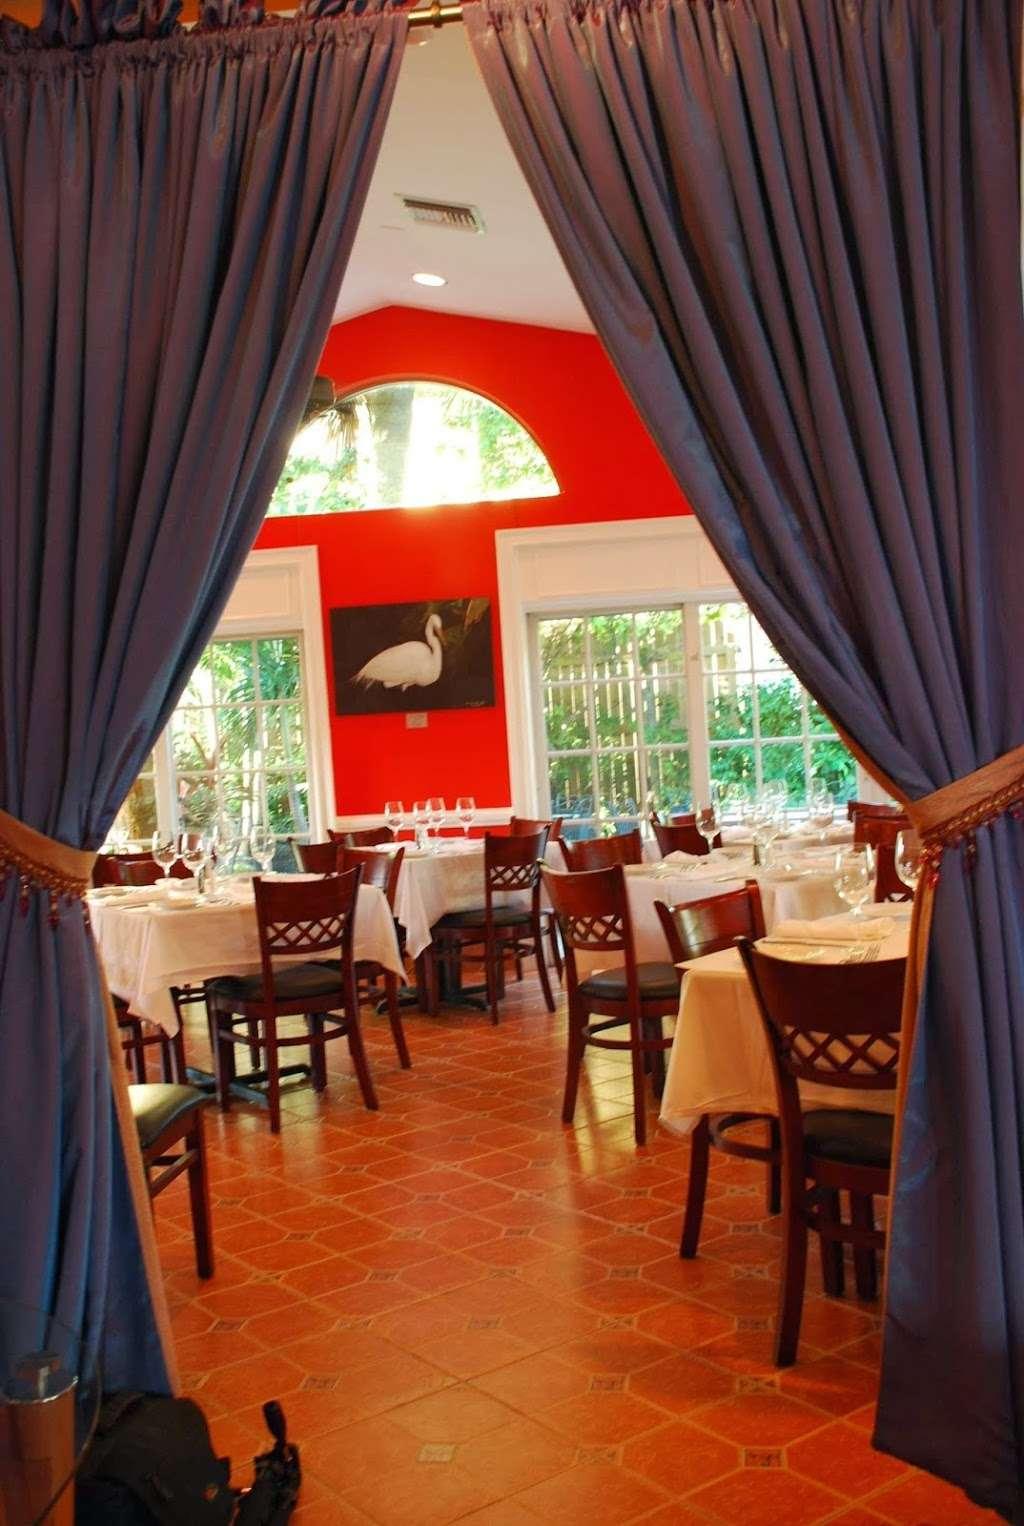 Patio Delray - restaurant    Photo 8 of 10   Address: 800 Palm Trail, Delray Beach, FL 33483, USA   Phone: (561) 279-0880